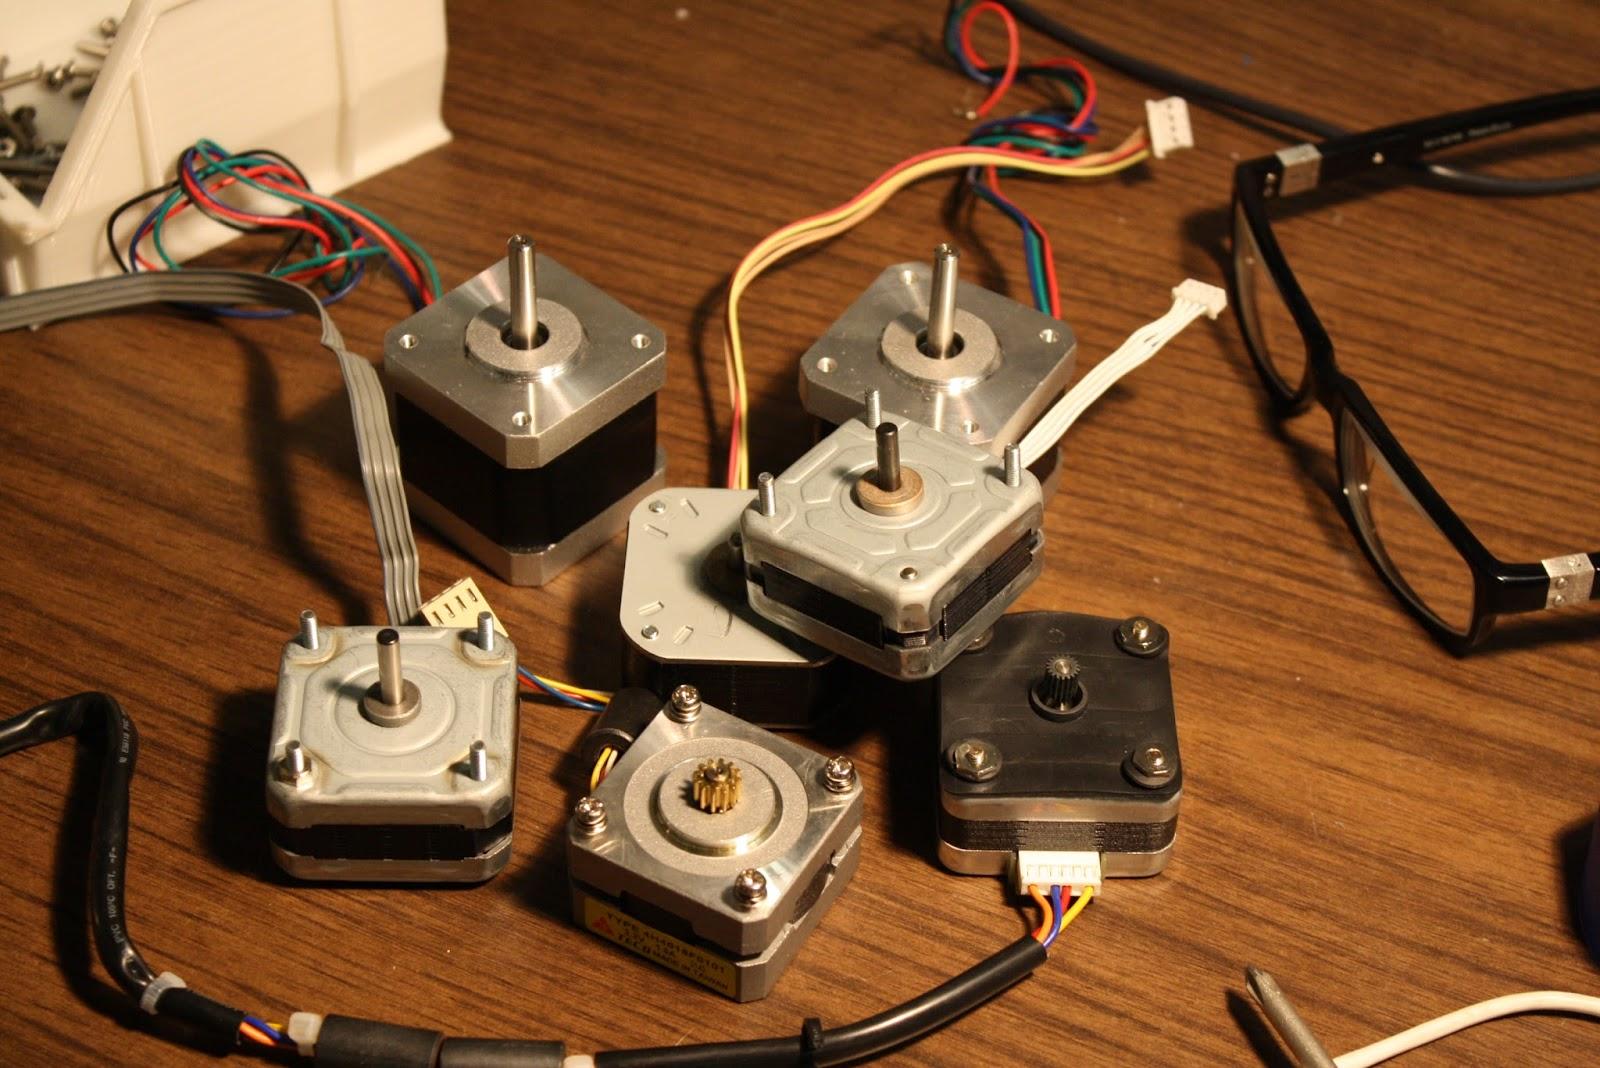 Bryan Cera Salvagable Printer Scanner Parts For 3d